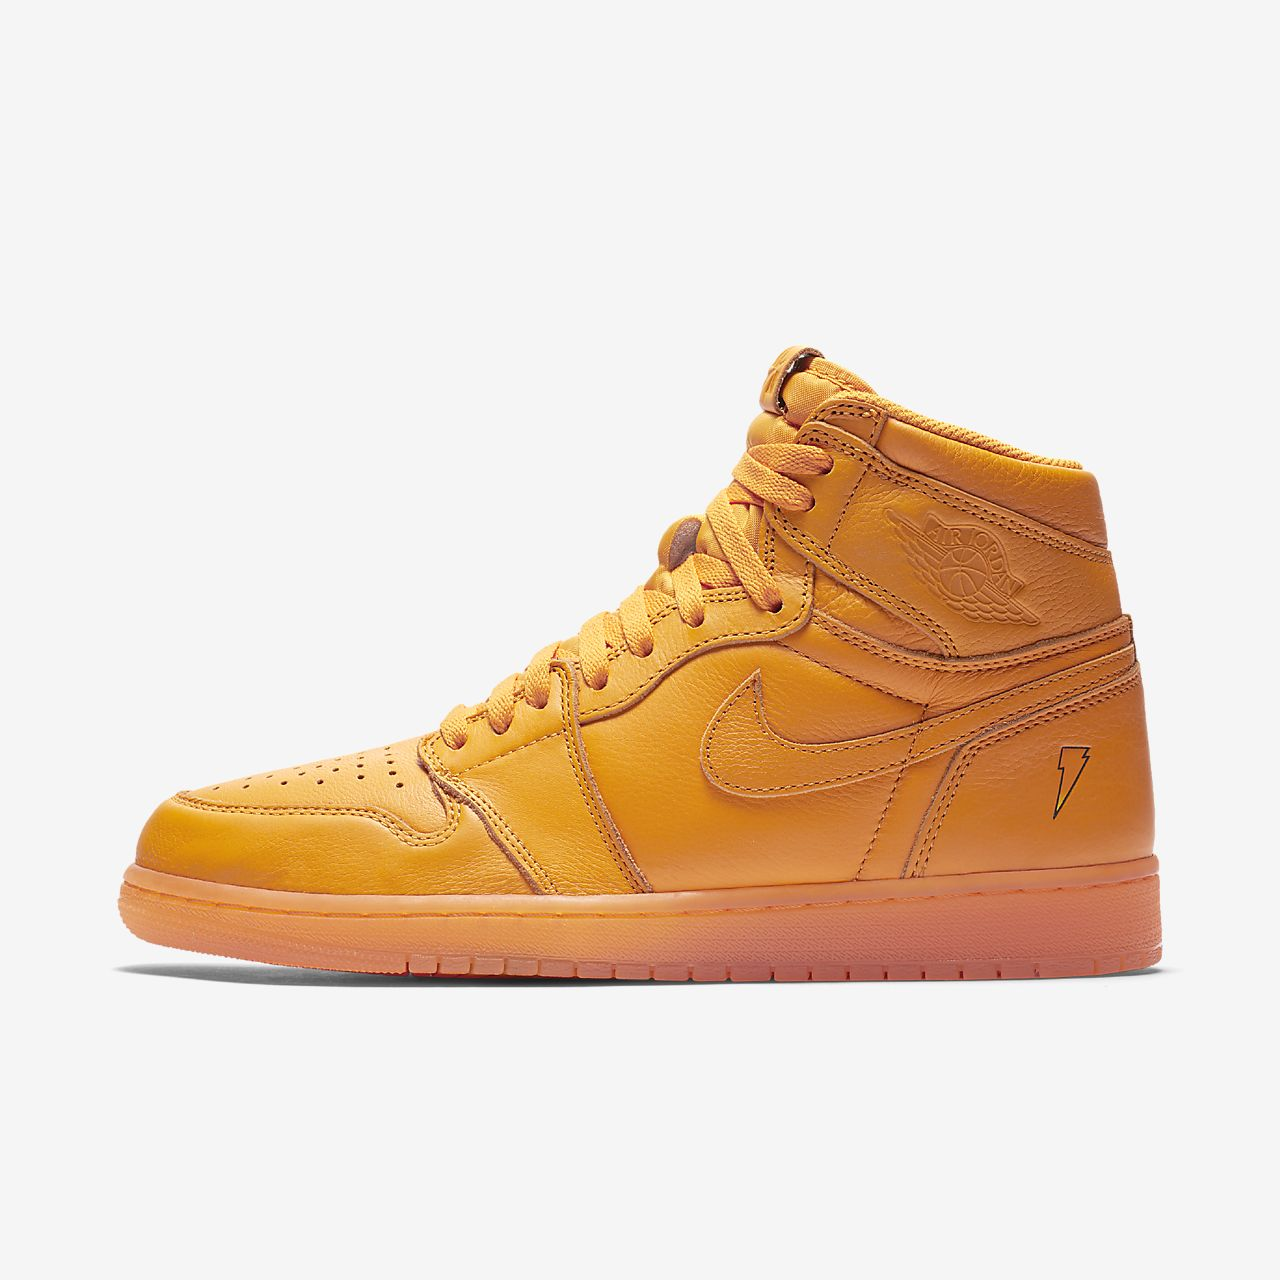 Jordan Retro OG «Orange» Air herreskoNO High 1 v0mNwn8